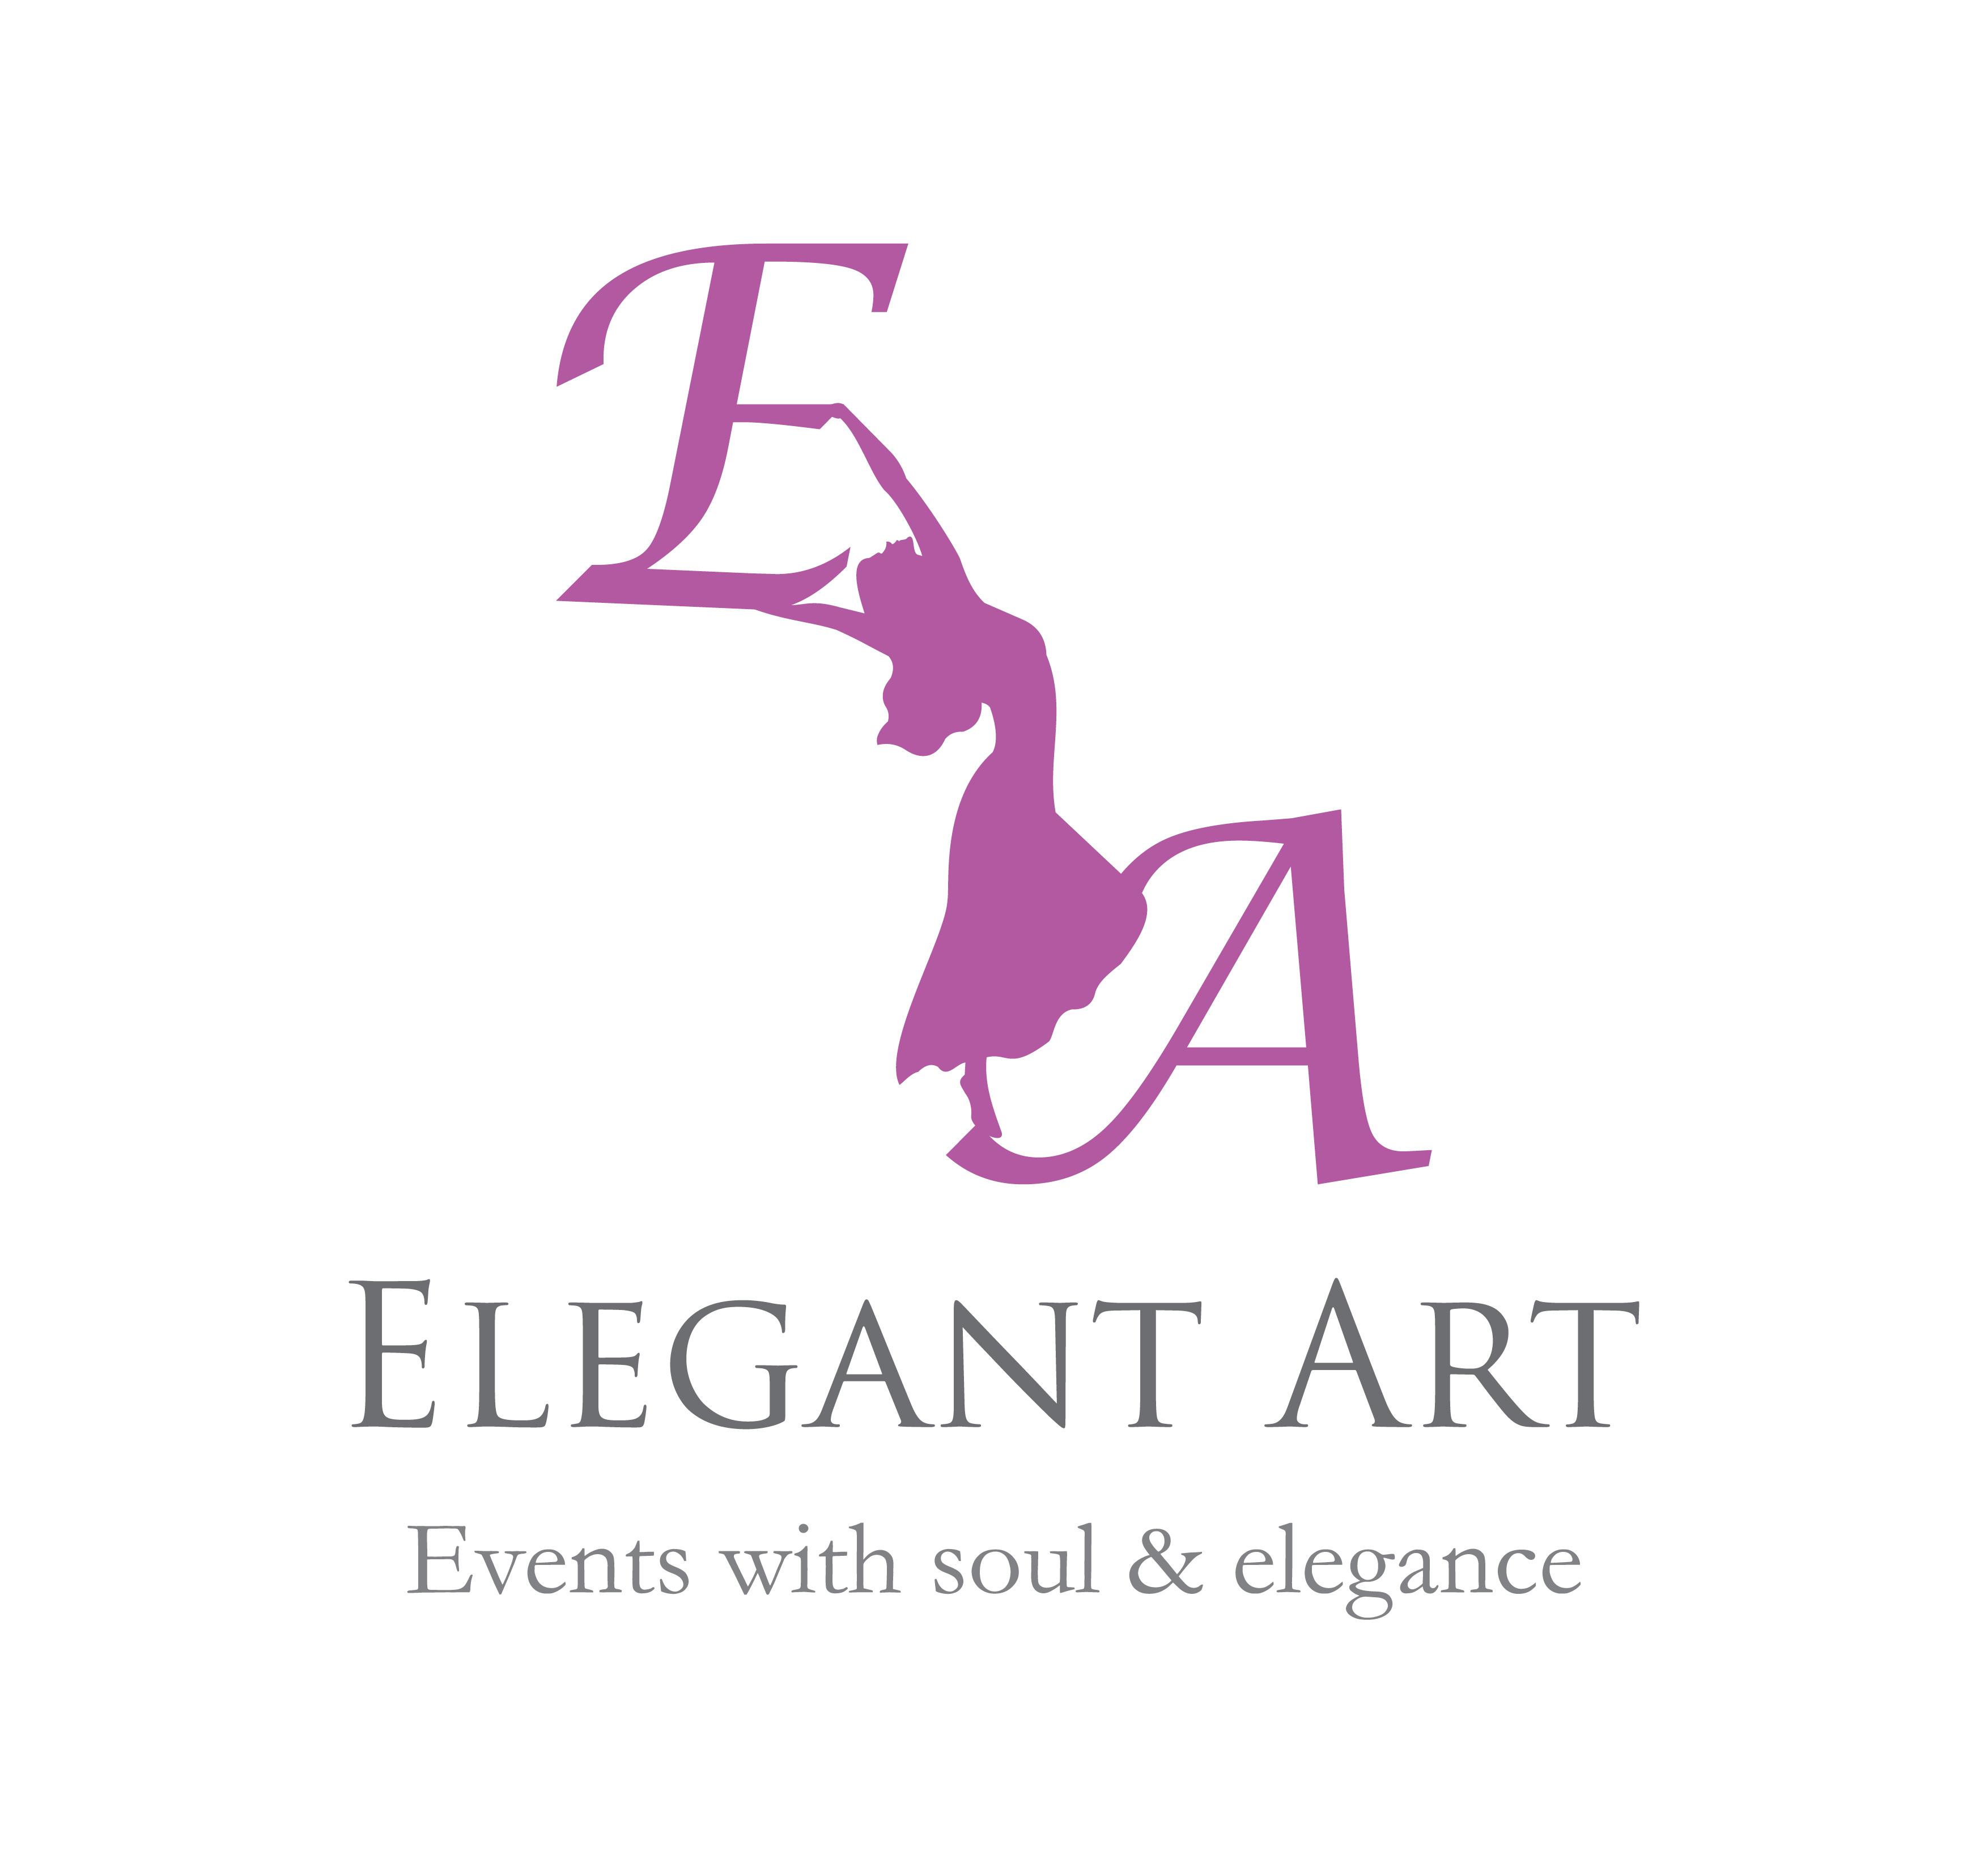 Elegant Art